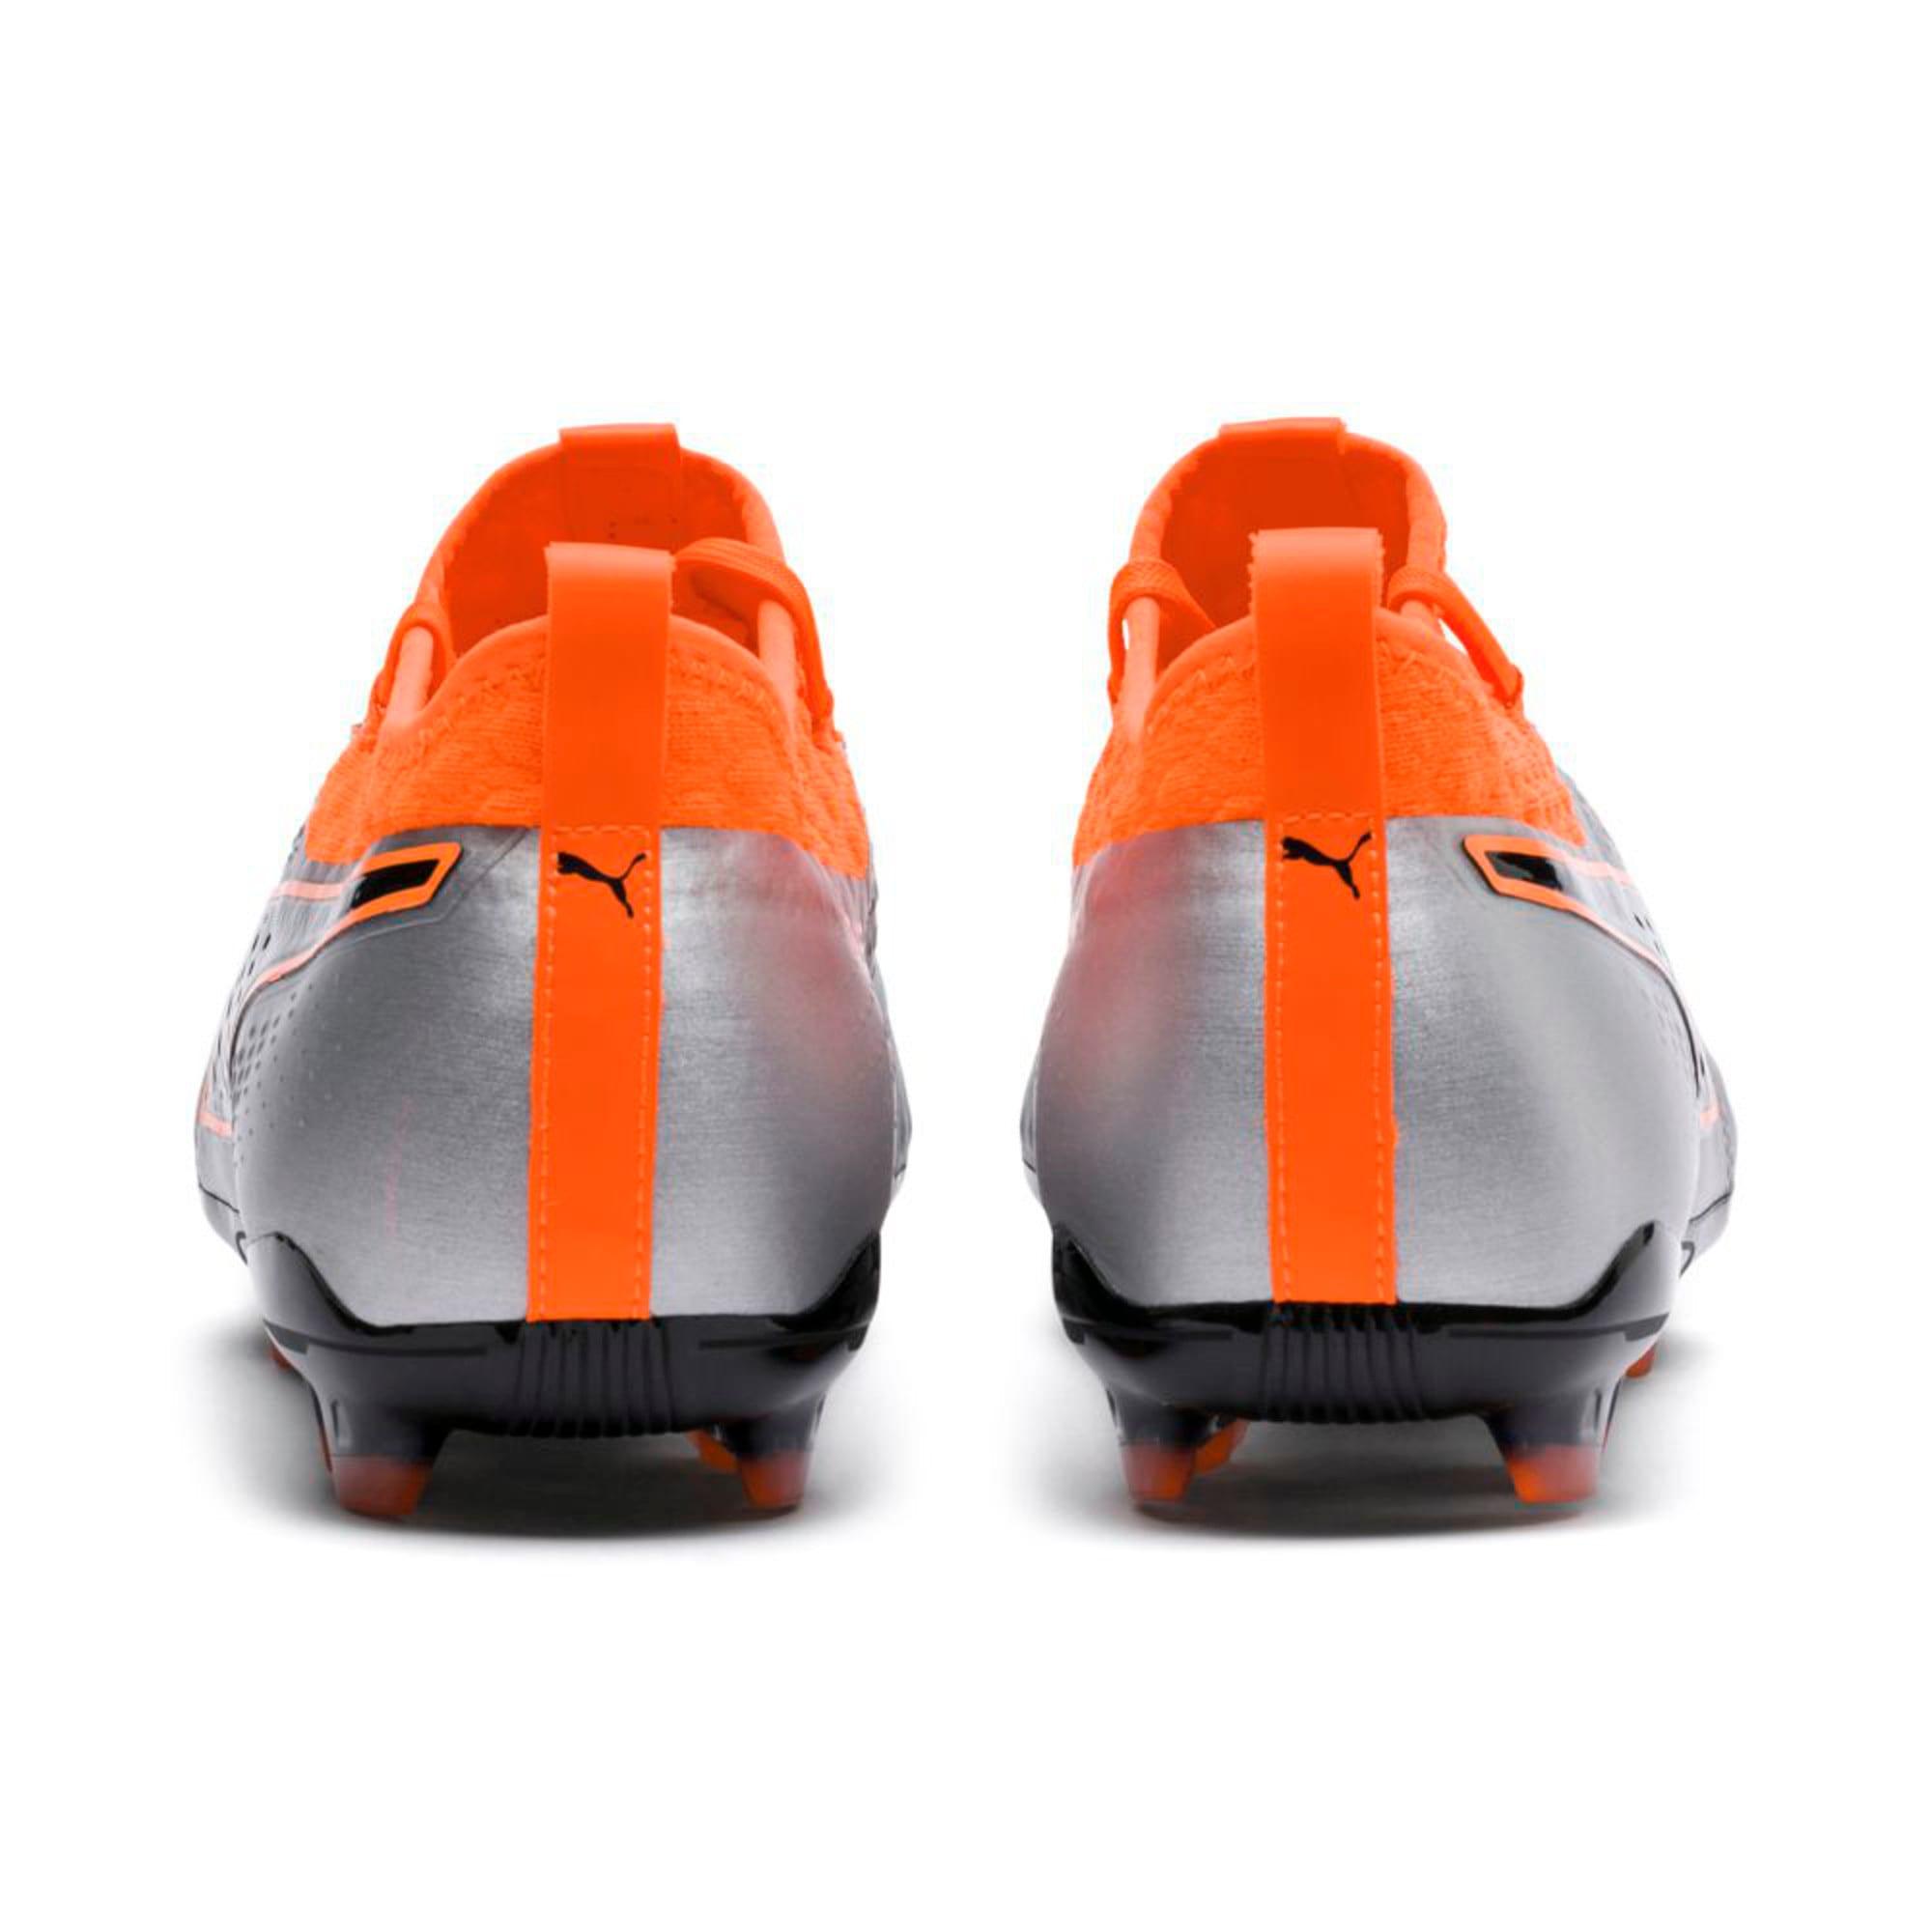 Thumbnail 4 of PUMA ONE 2 Leather FG  Football Boots, Silver-Orange-Black, medium-IND